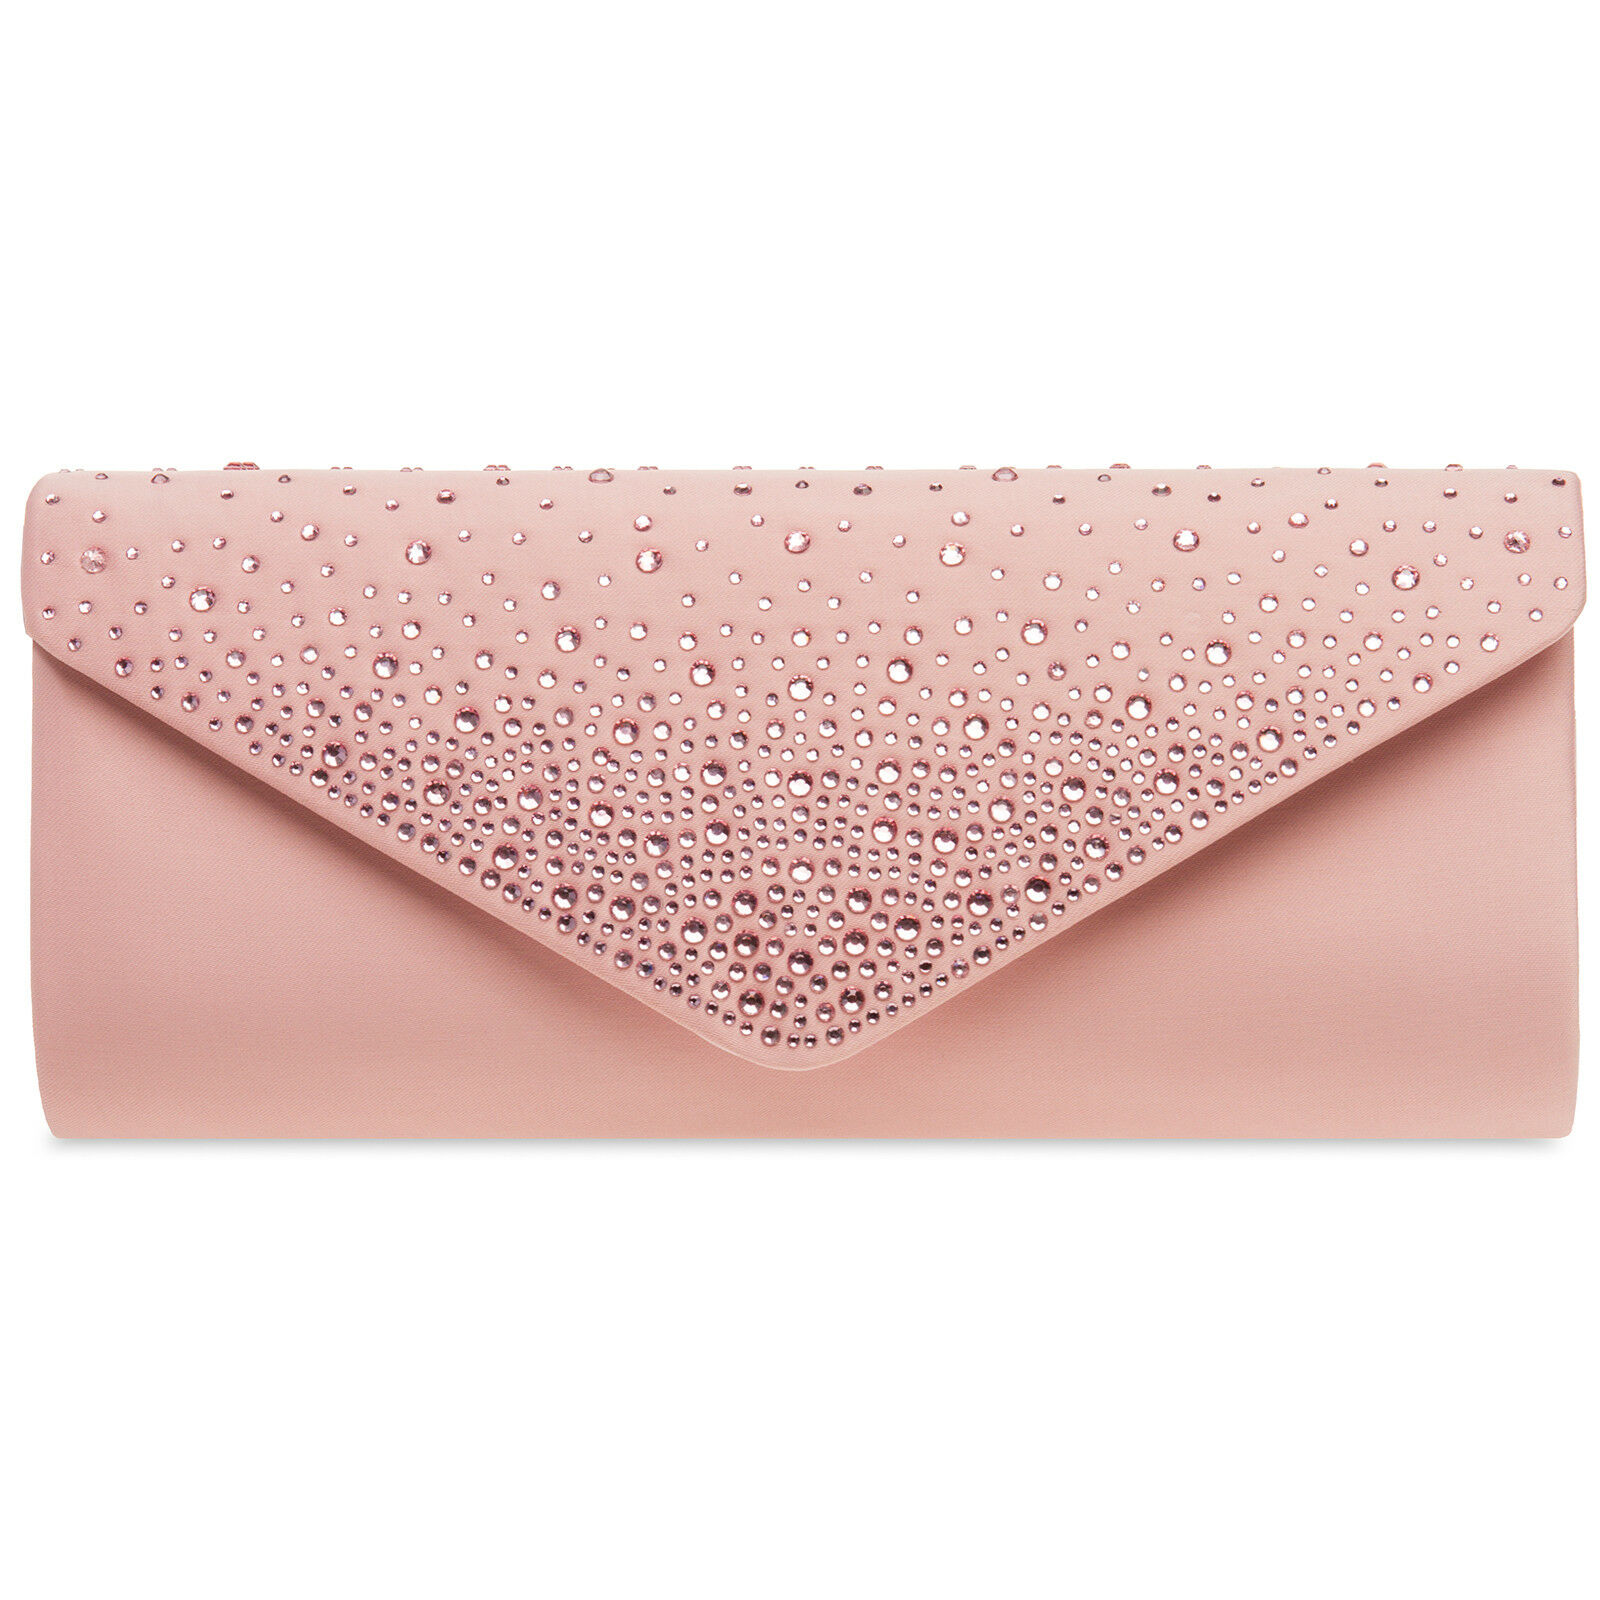 CASPAR TA422 Damen Clutch Tasche Abendtasche Baguette Briefumschlag Altrosa Rosa